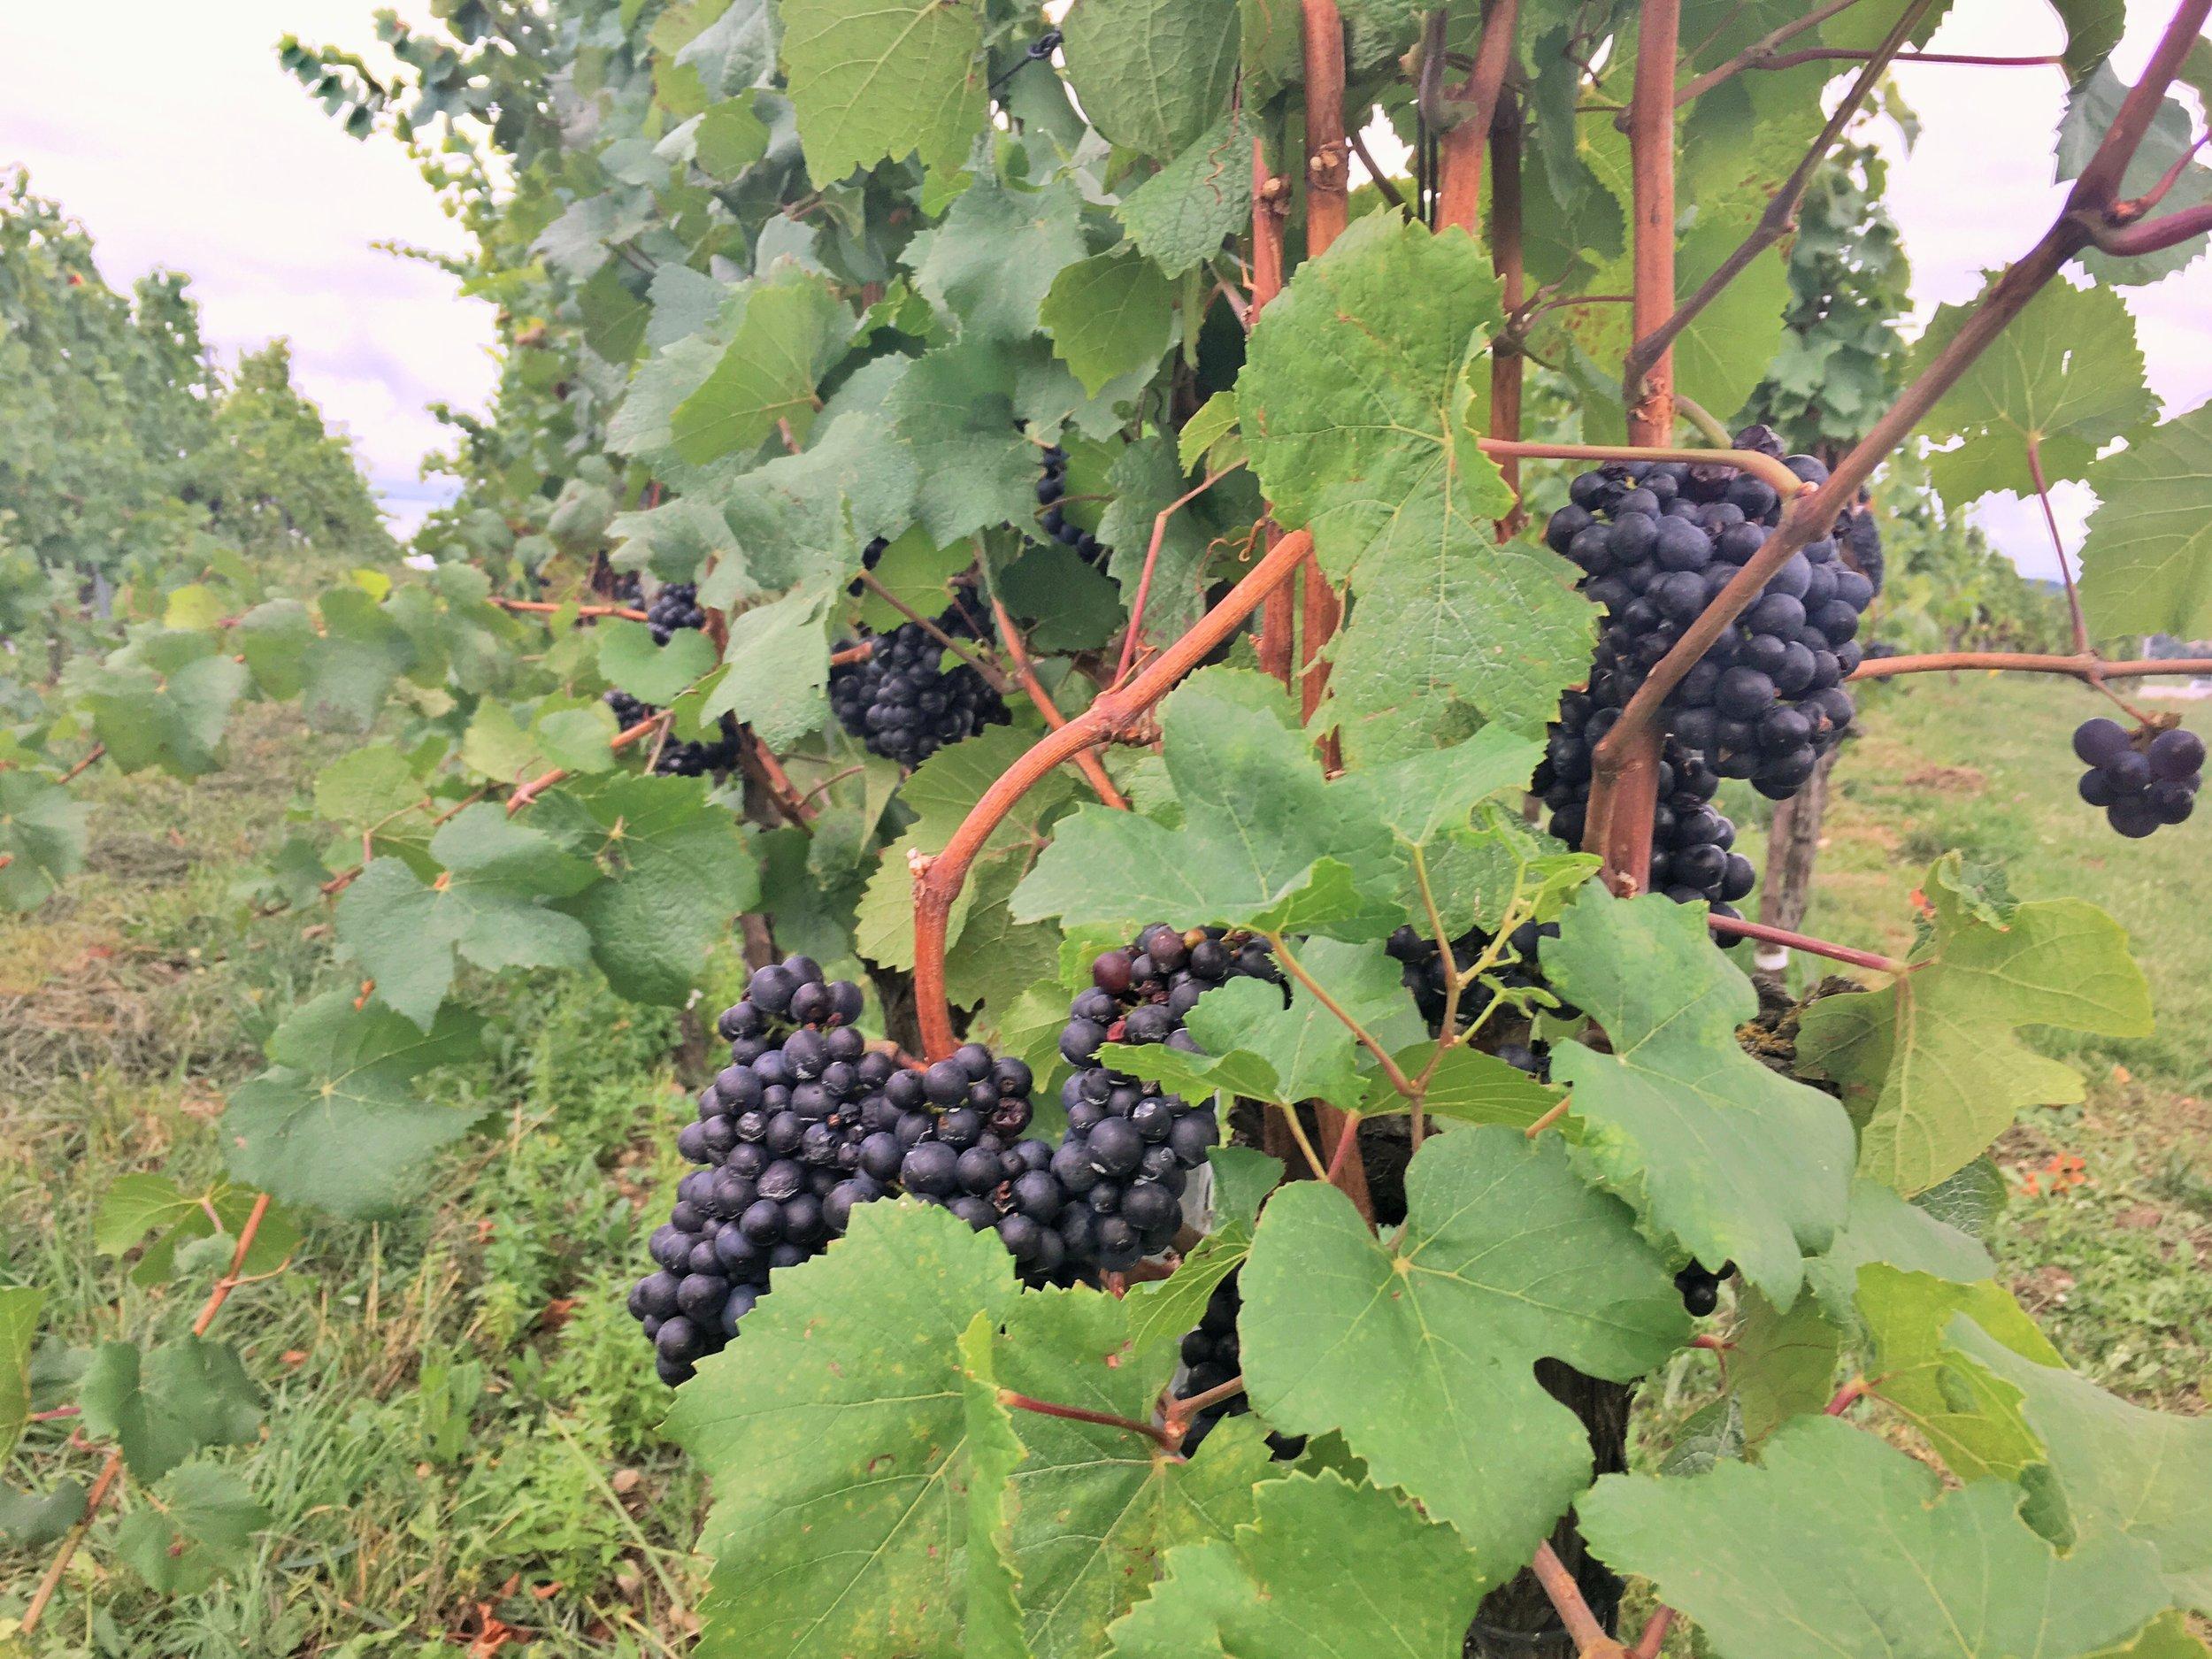 Grapes Auvernier Switzerland September 2017